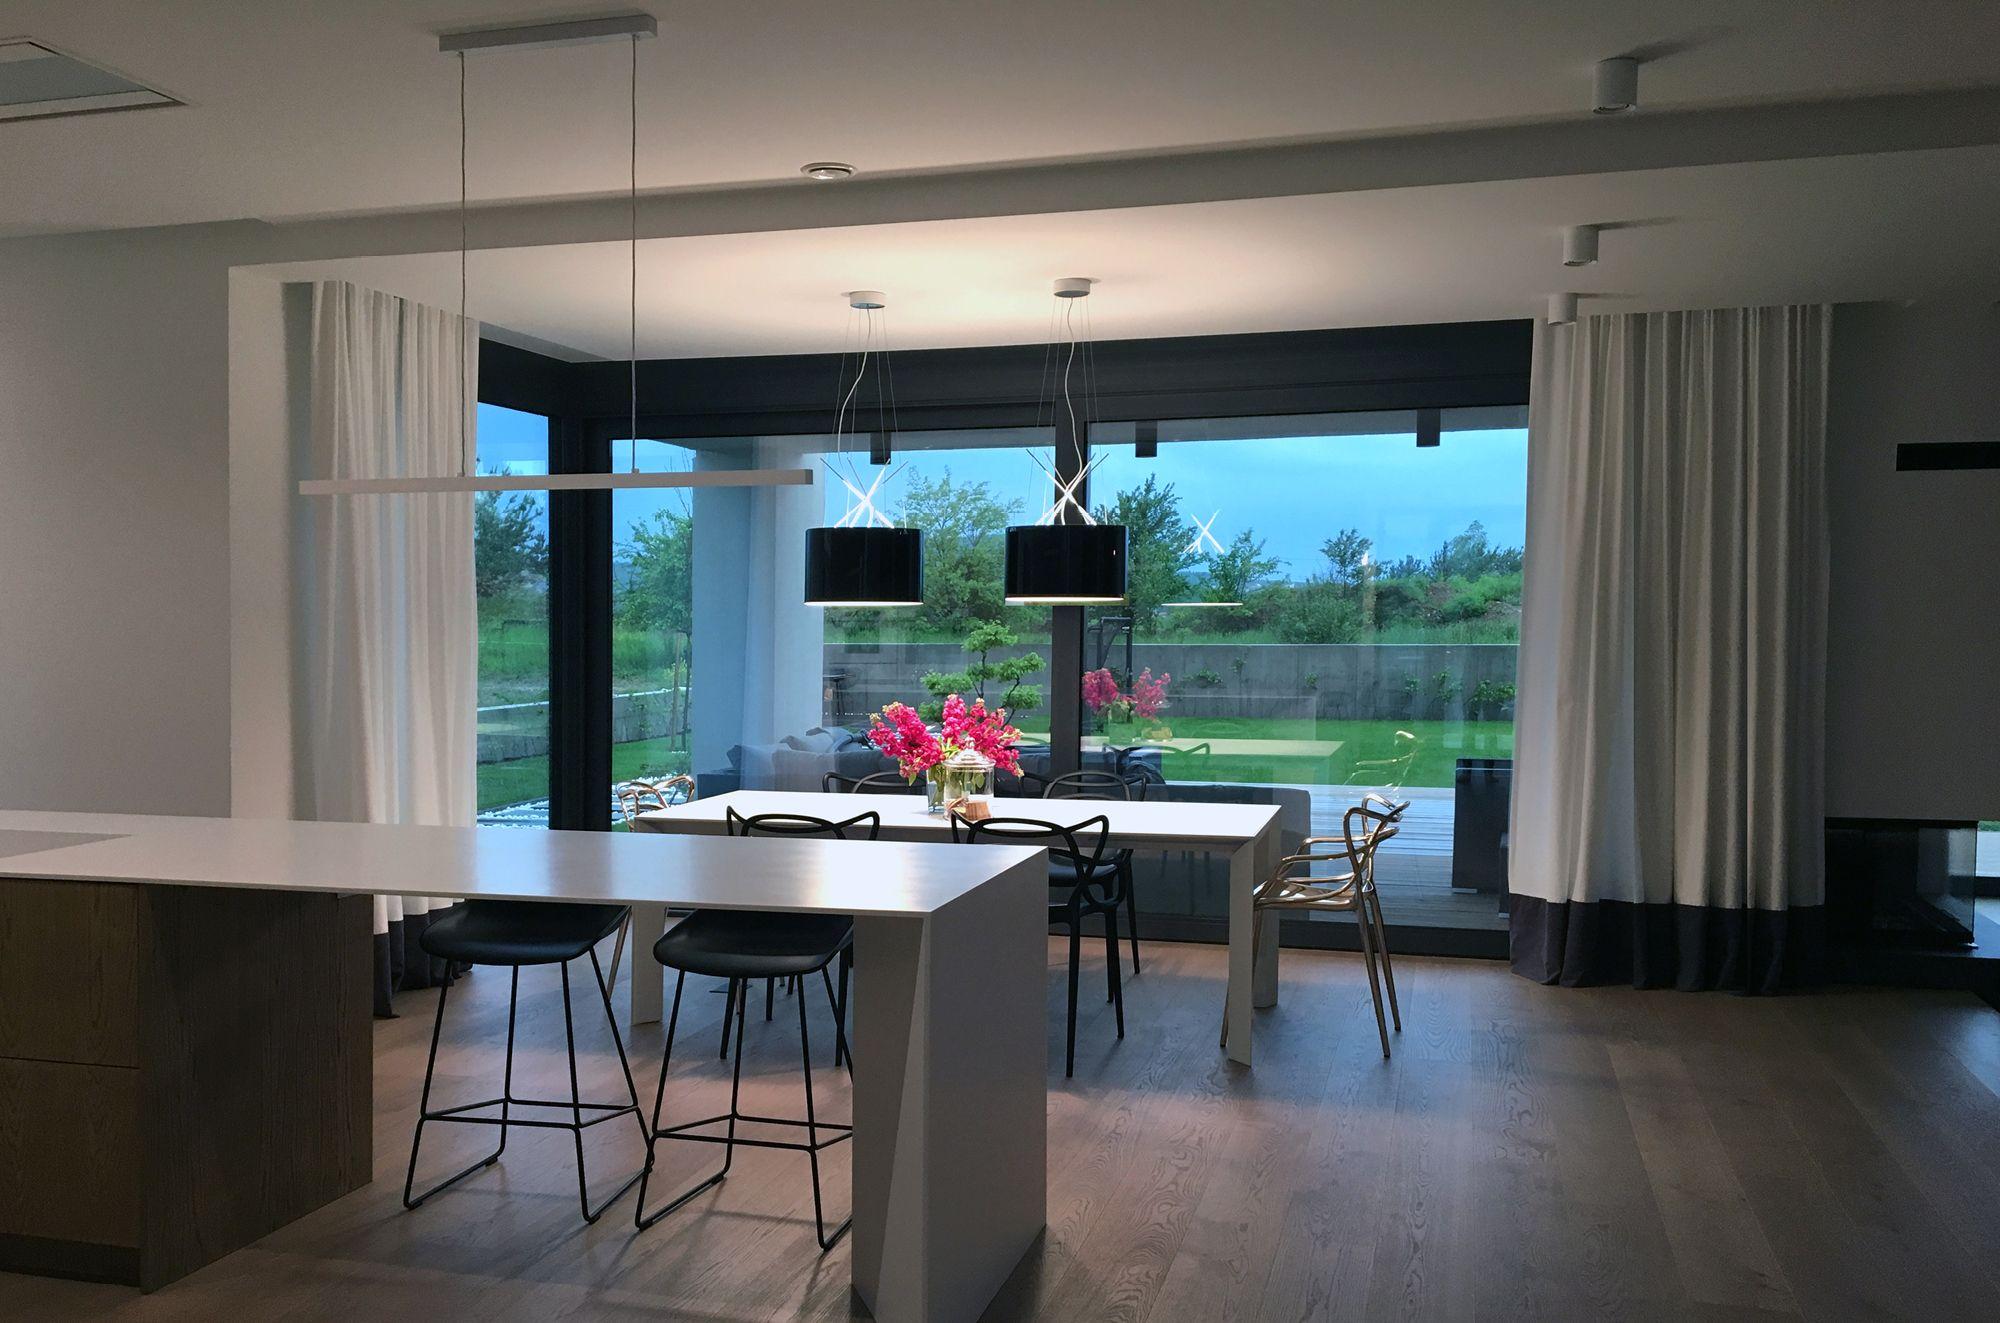 Dom 340m² – Realizacja (Coming soon)